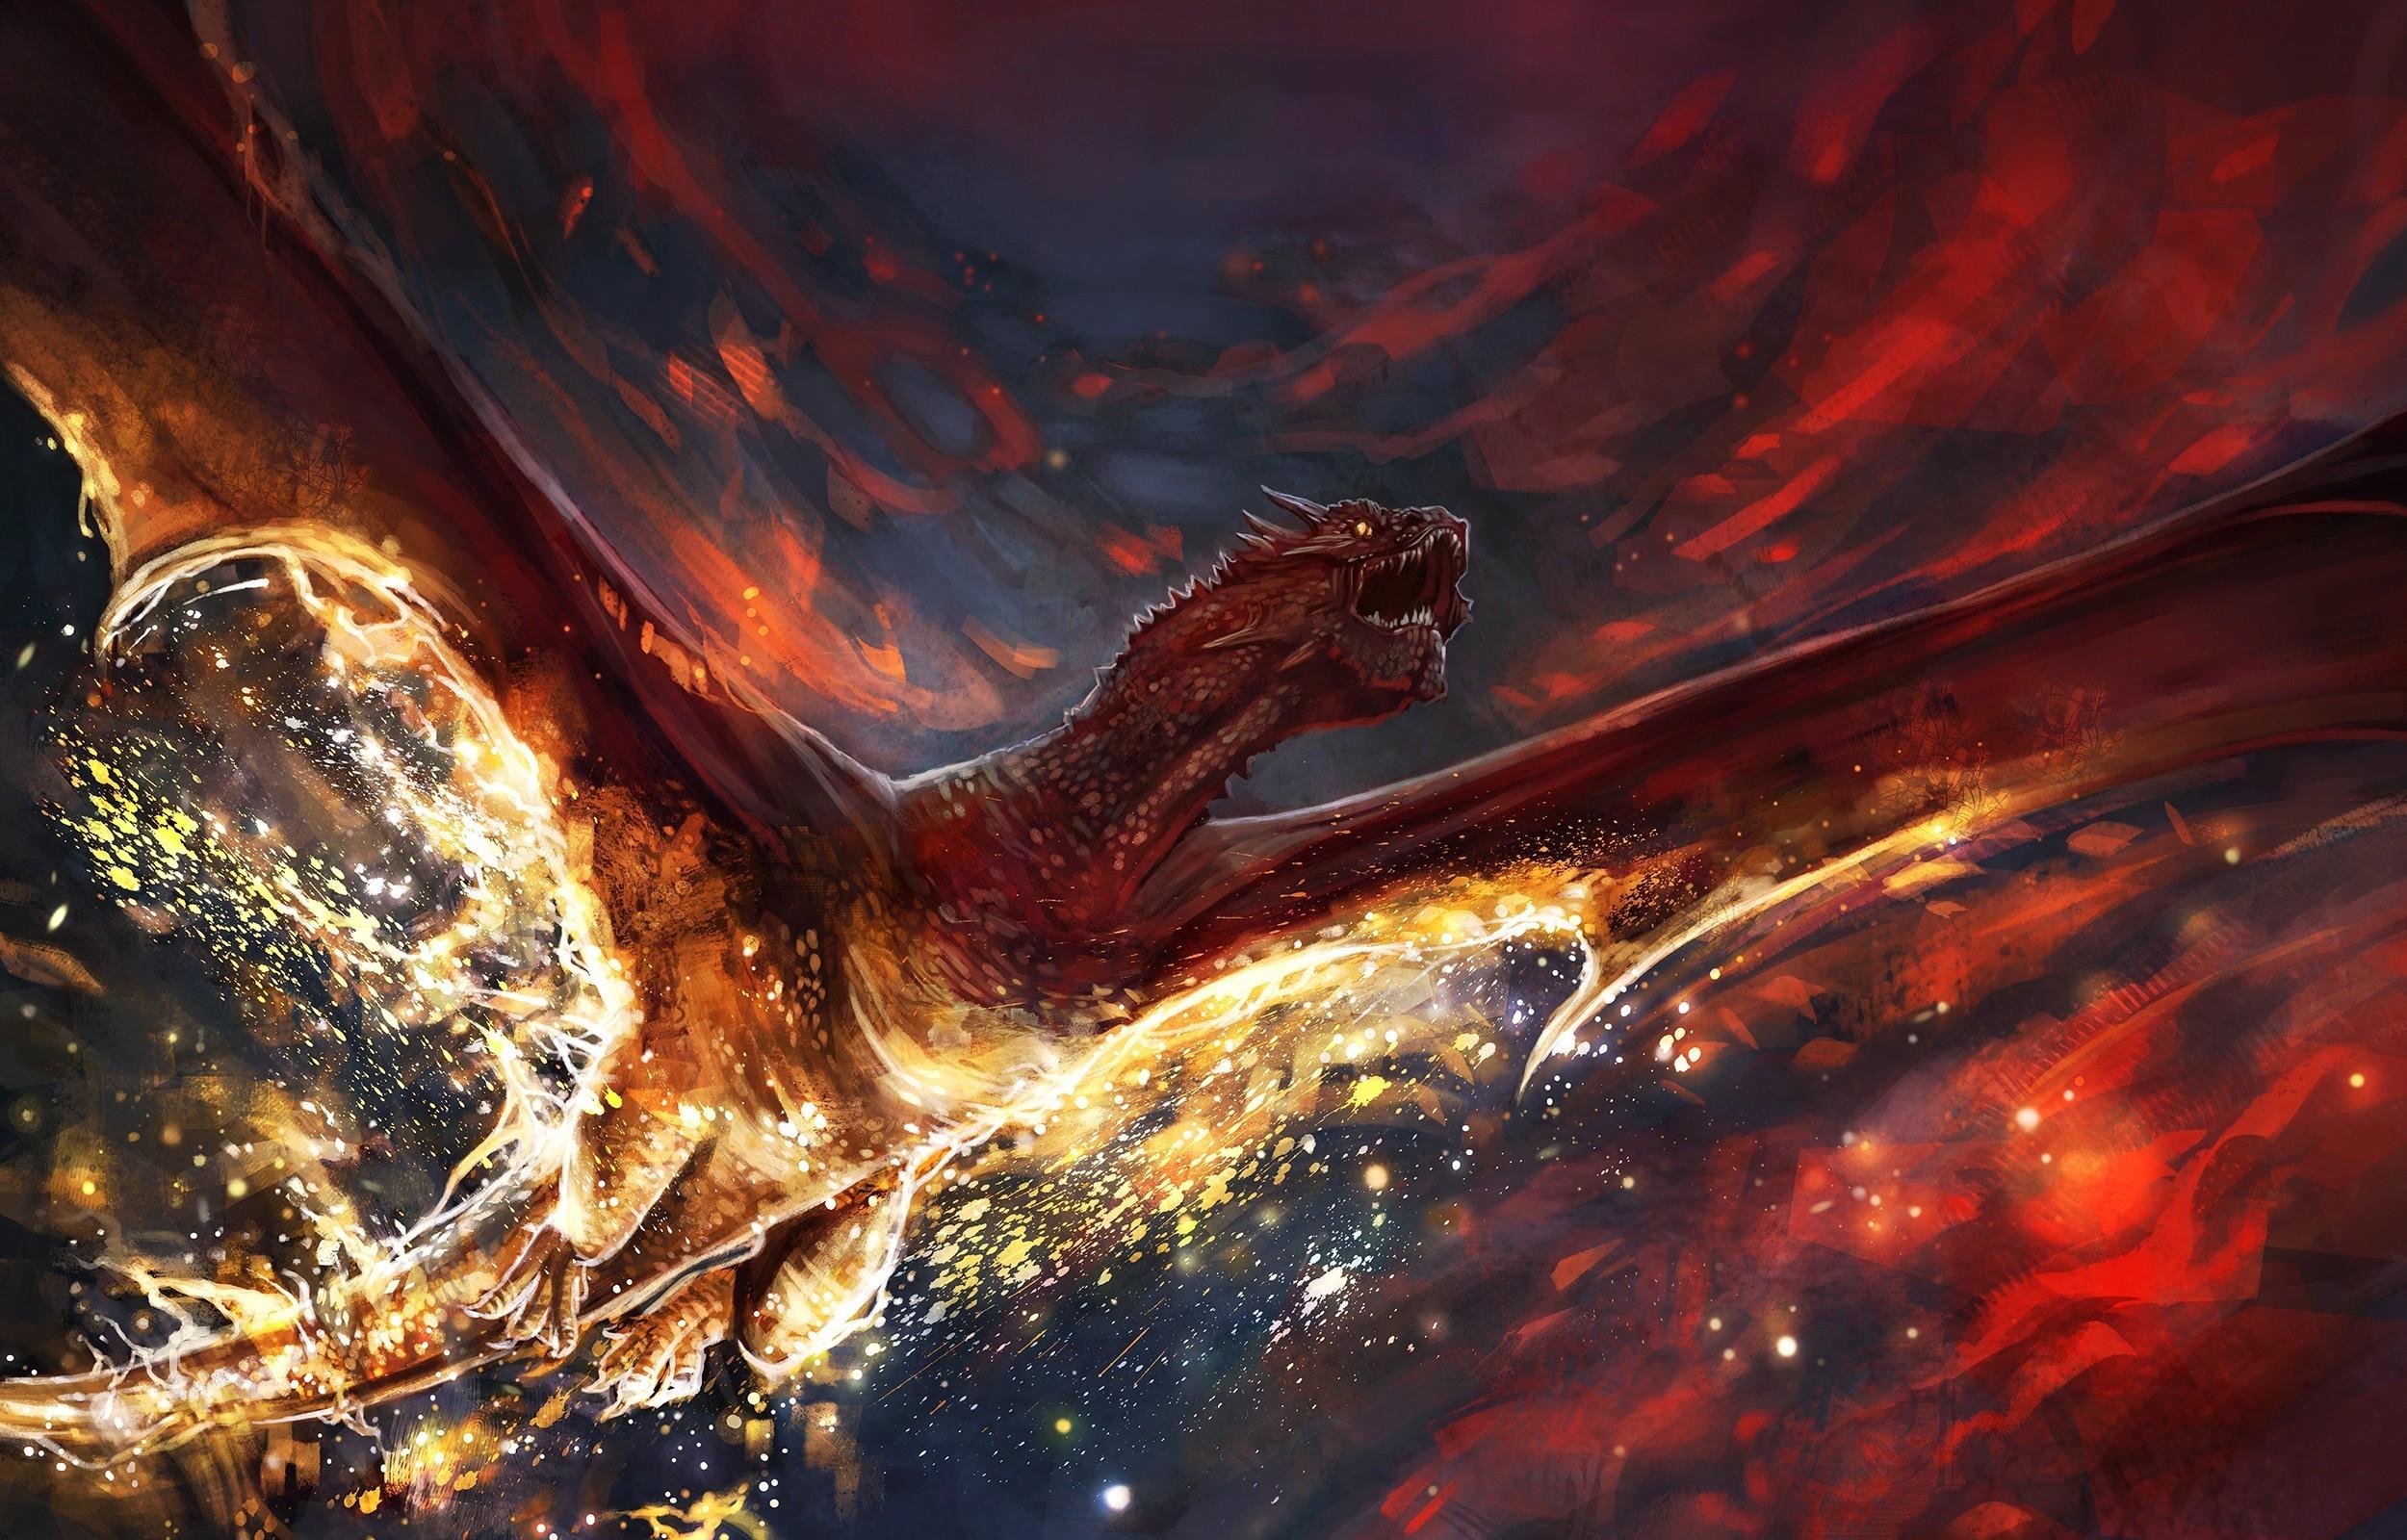 Earth Digital Art Hd Wallpaper: Wallpaper : Digital Art, Fantasy Art, Artwork, Earth, Fire